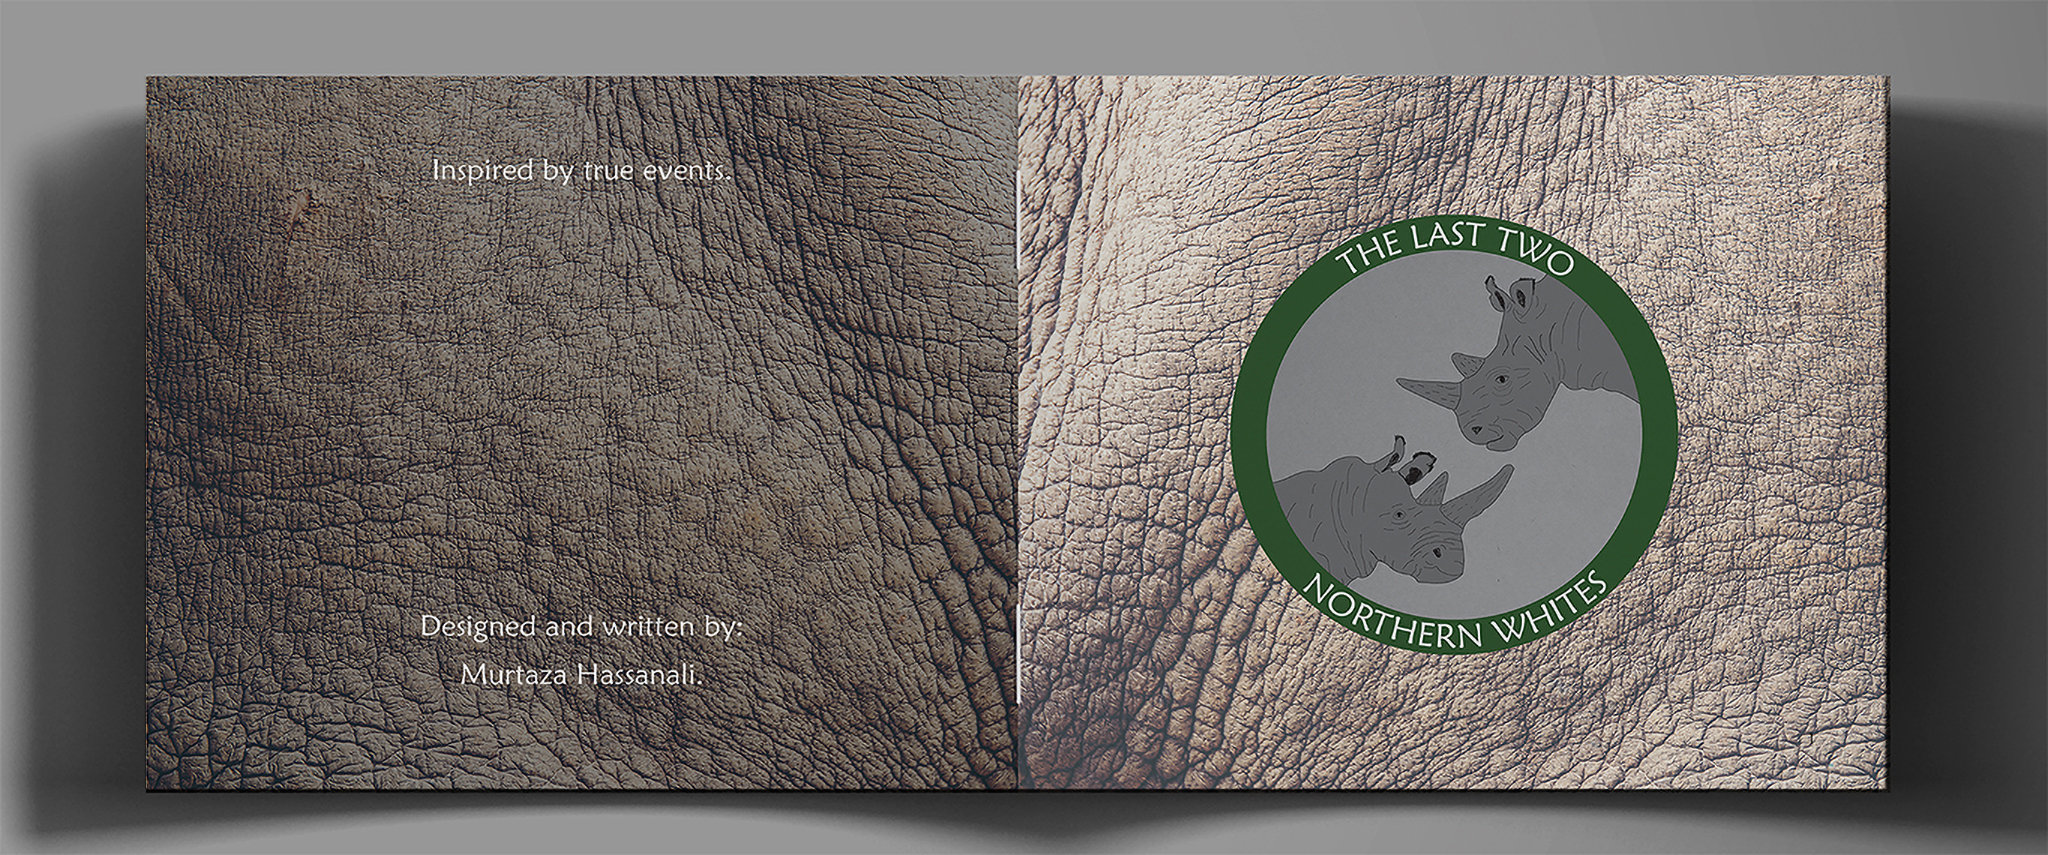 Murtaza S A Hassanali Graphics and Design